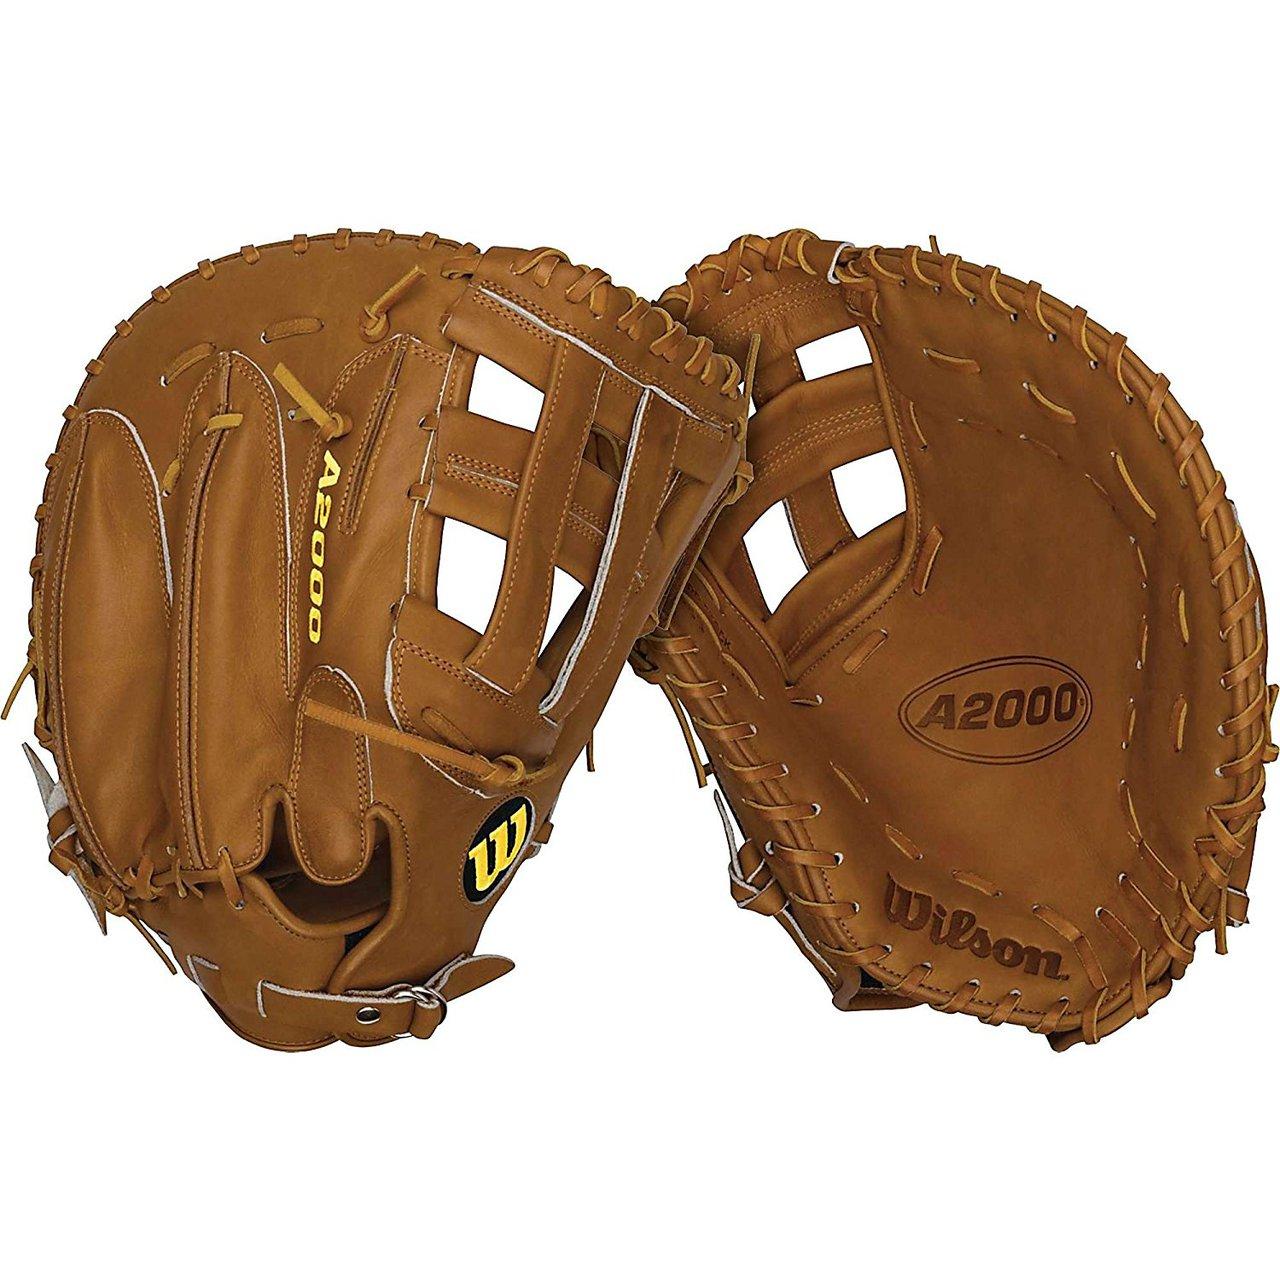 wilson-a2000-1883-baseball-first-base-mitt-12-5-left-hand-throw A2802BB1883-LeftHandThrow  887768113964 Since its introduction in 1957 the Wilson A2000 Series has set